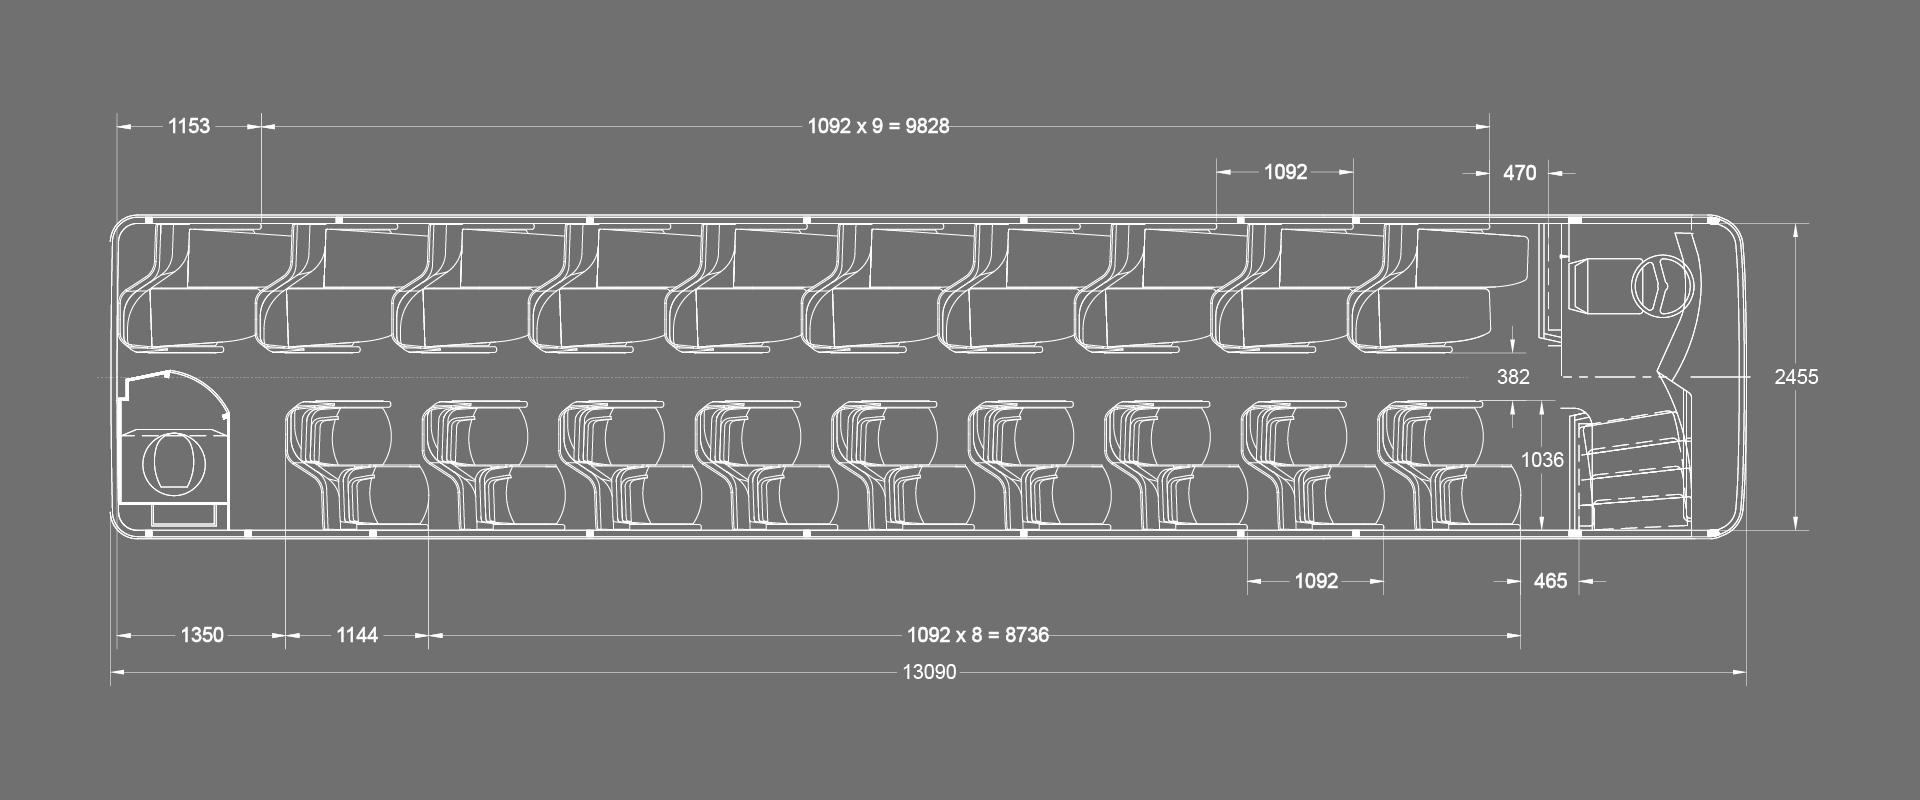 Layout 13.8m Coach with Lavatory